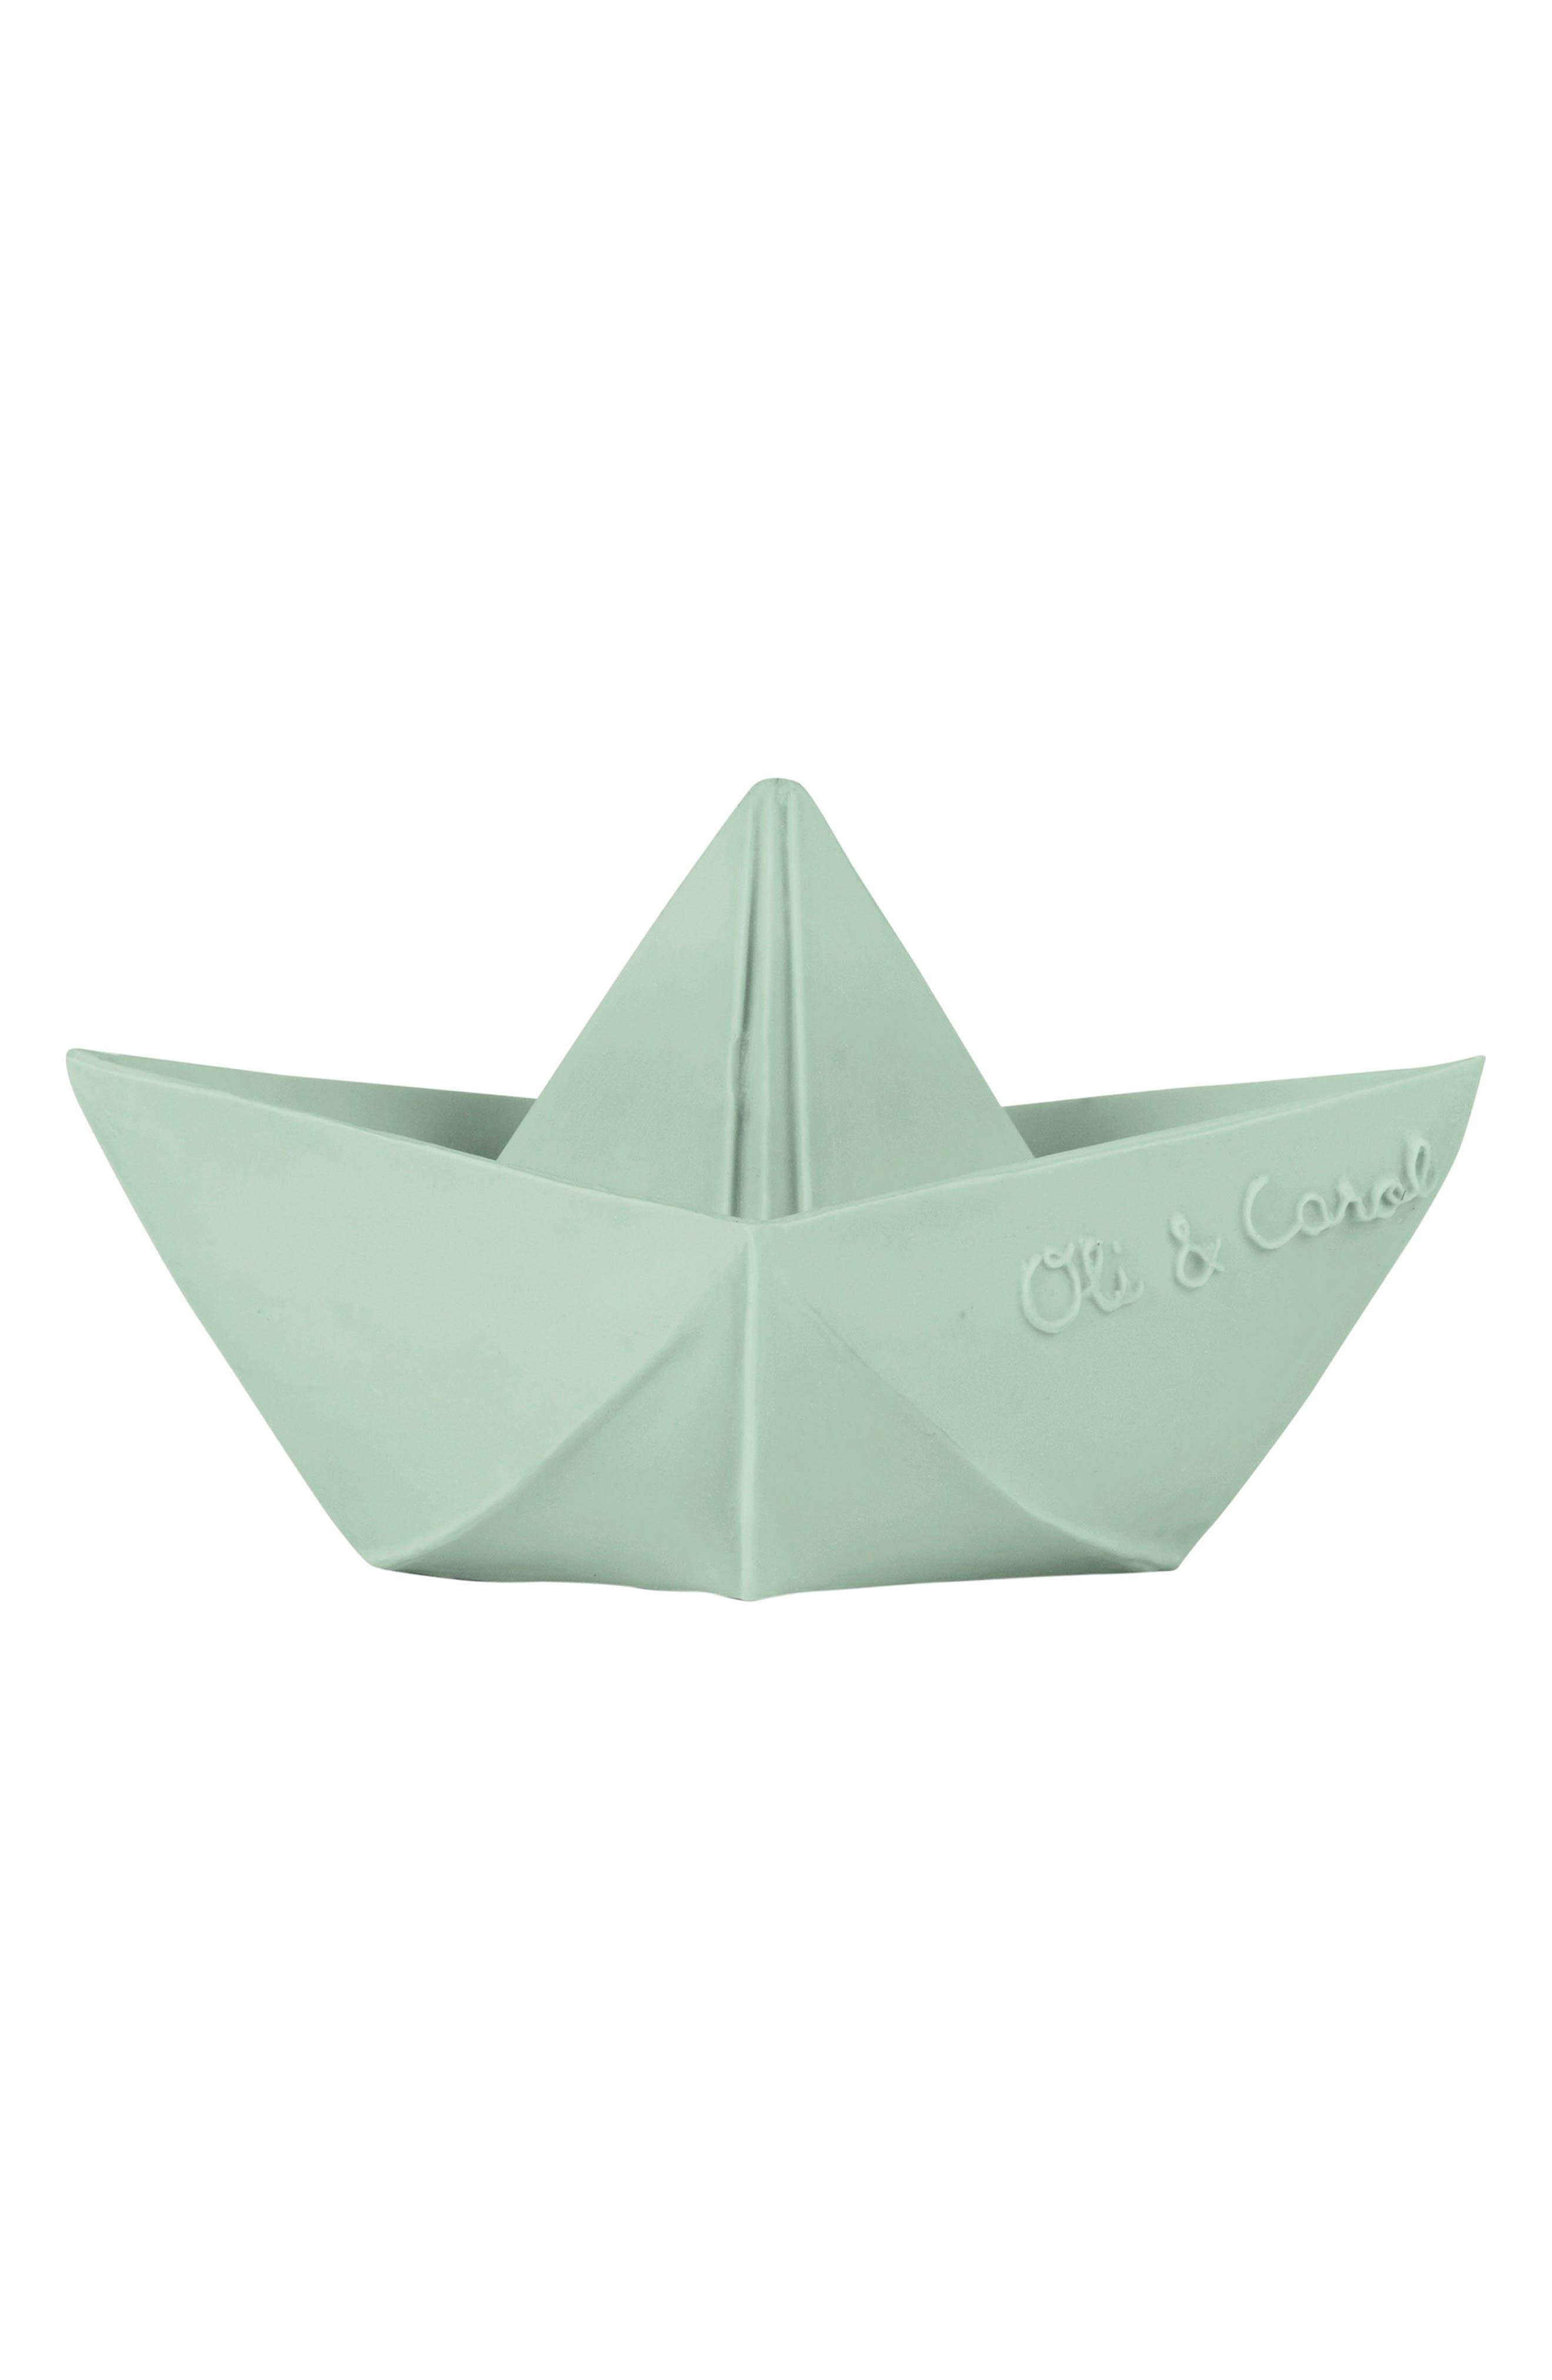 Alternate Image 3  - Oli & Carol Origami Boat Bath Toy